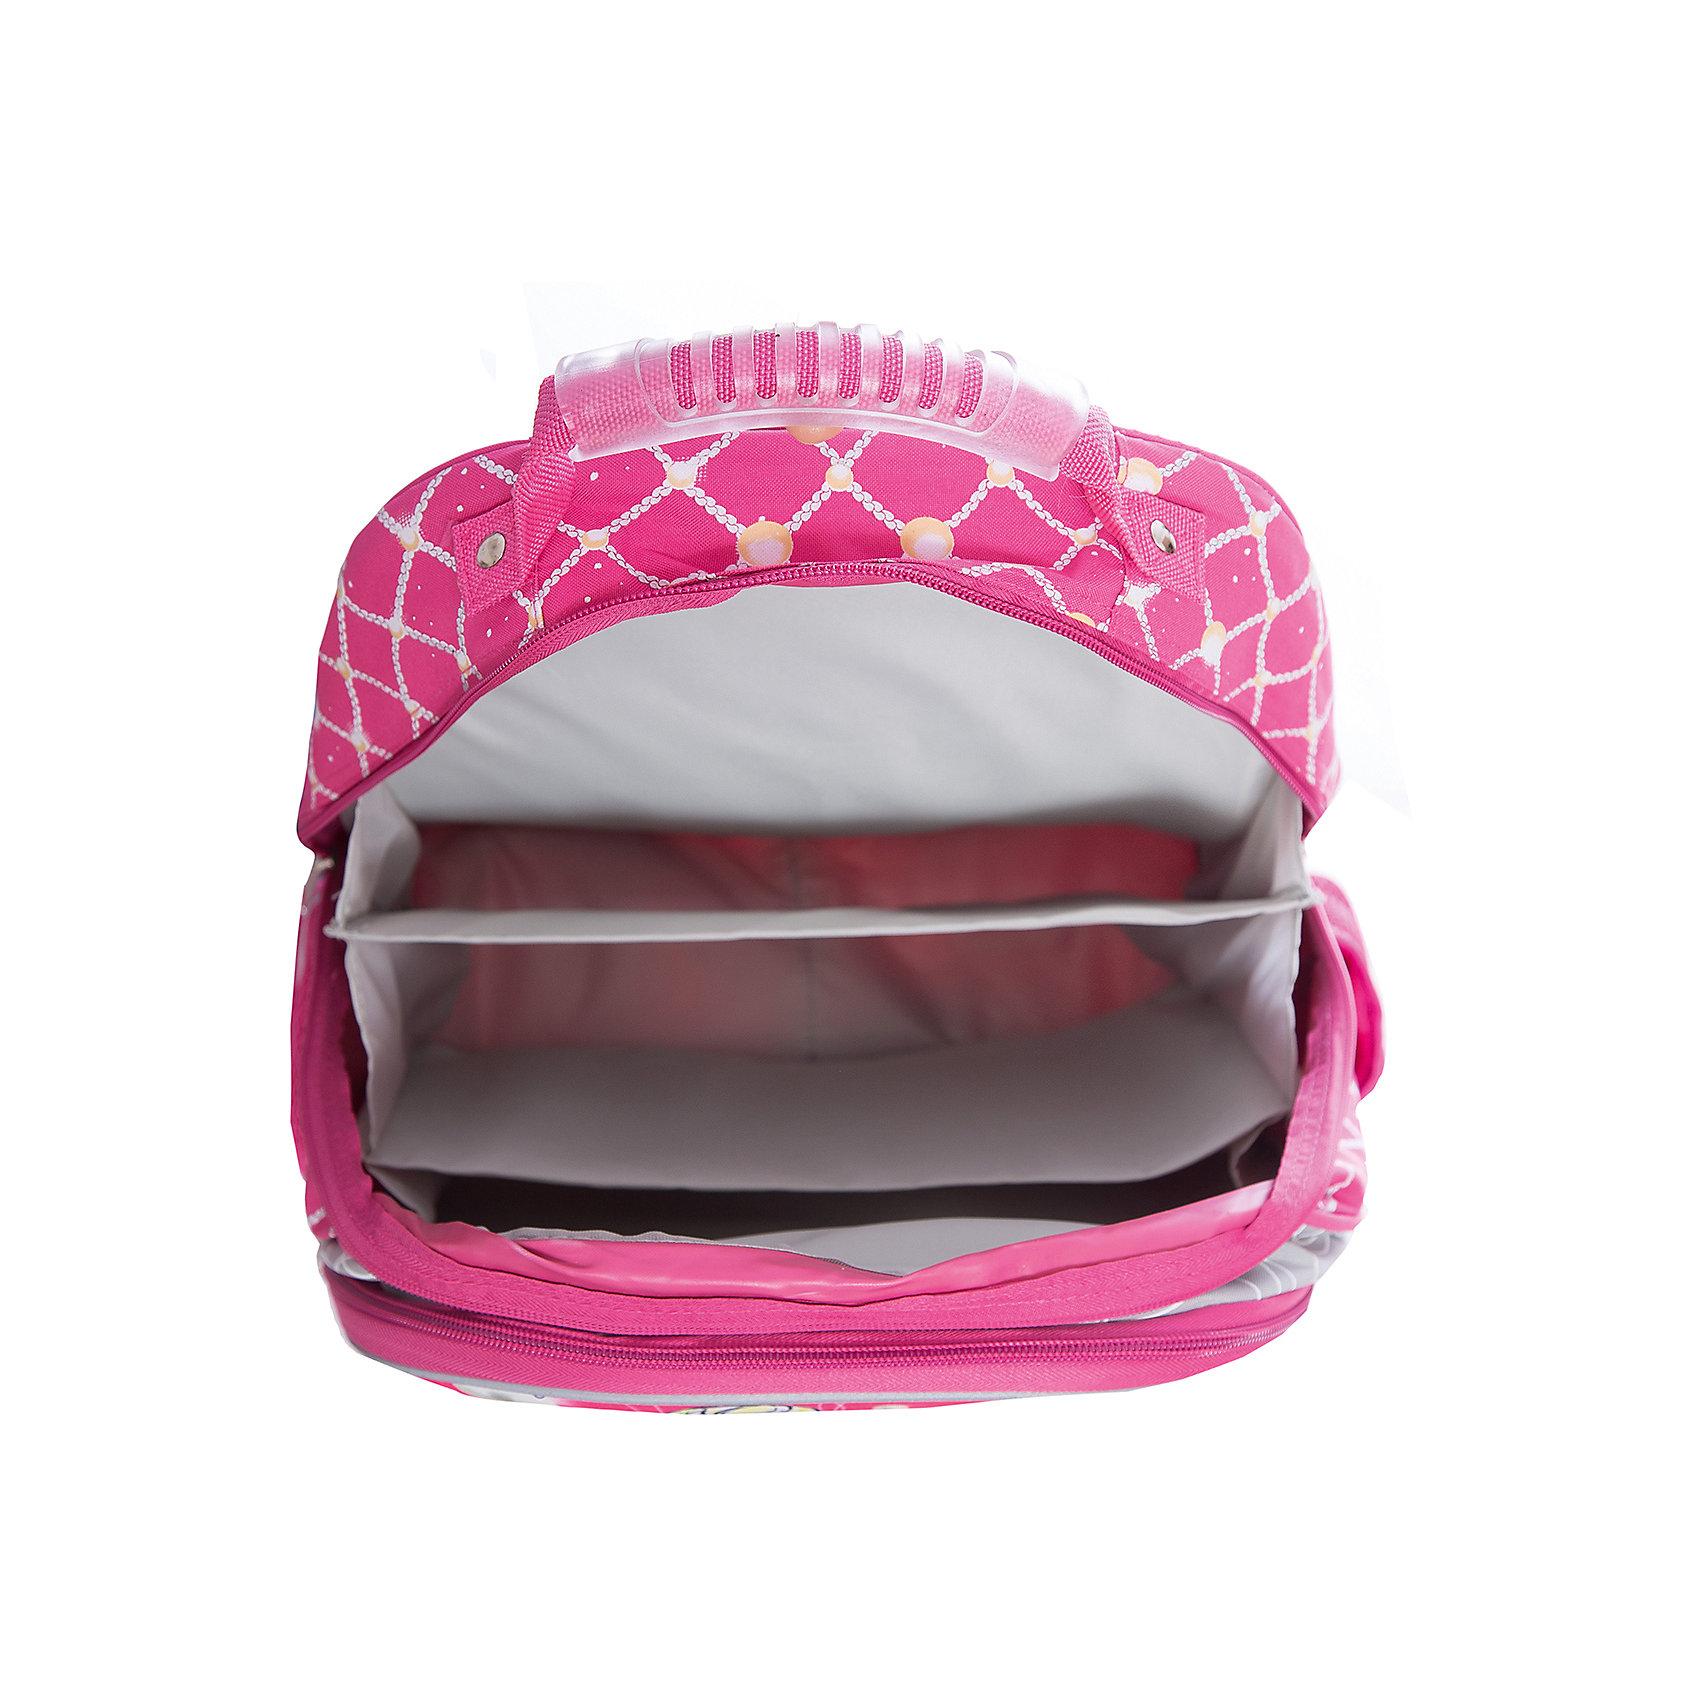 beda3d067808 Limpopo / Ранец Super bag Принцесса-балерина, ортопедическая спинка ...